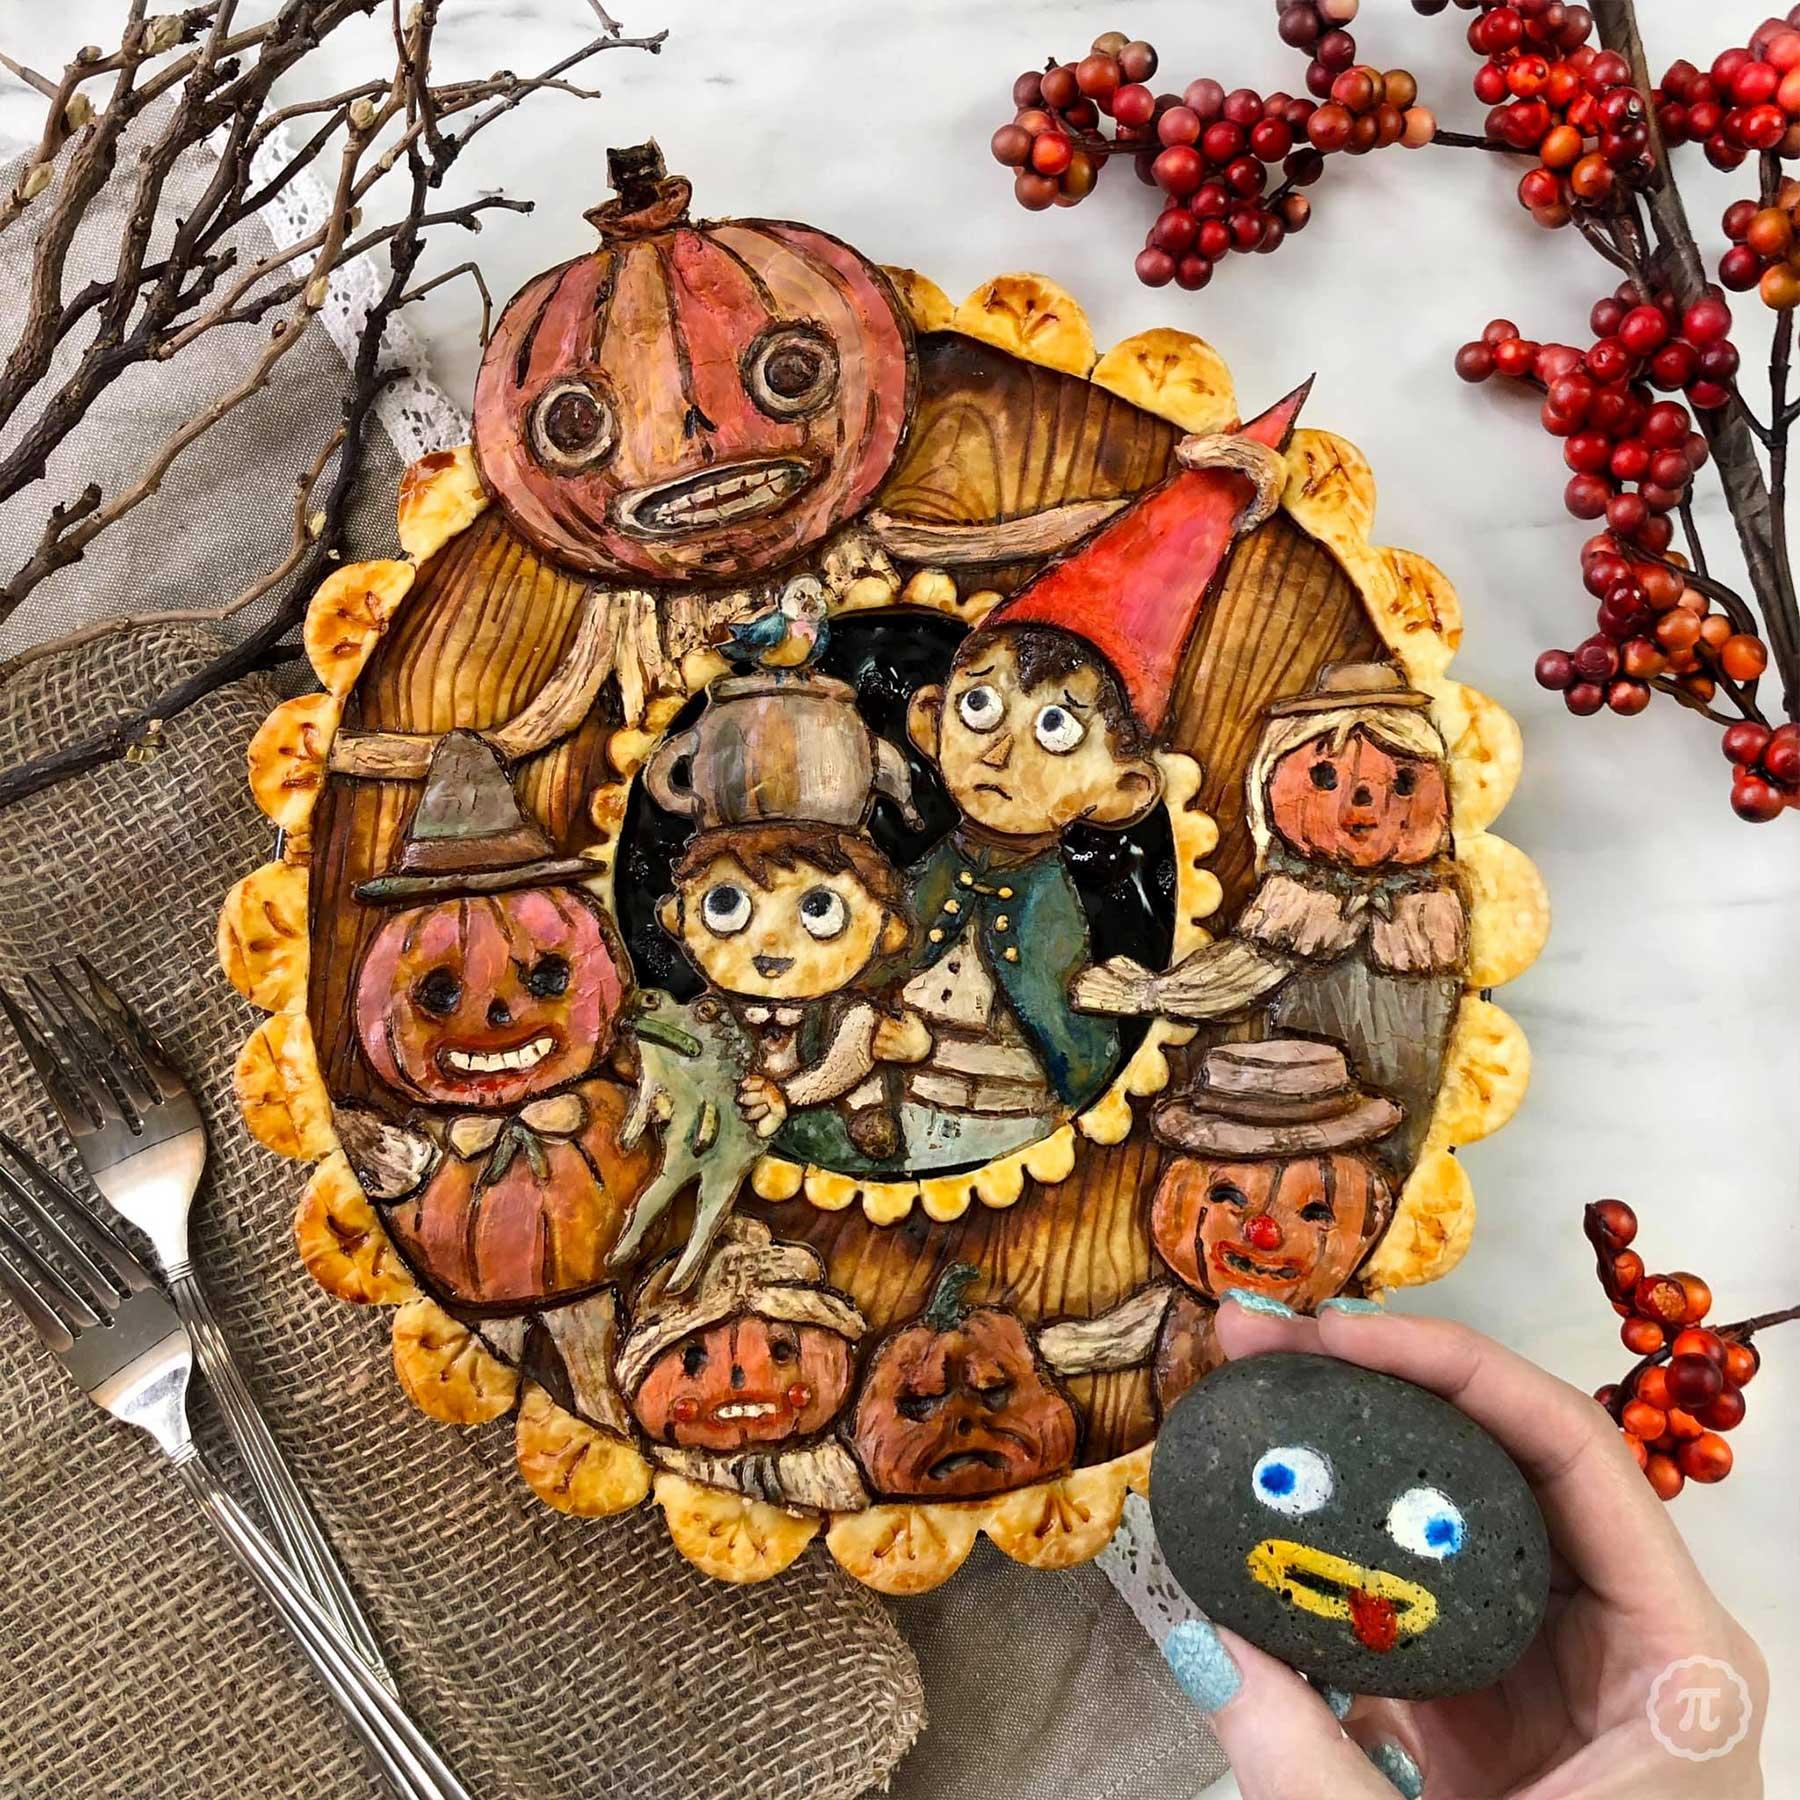 Kreative Kuchenkunst von Jessica Clark-Bojin piesareawesome-Jessica-Clark-Bojin_07